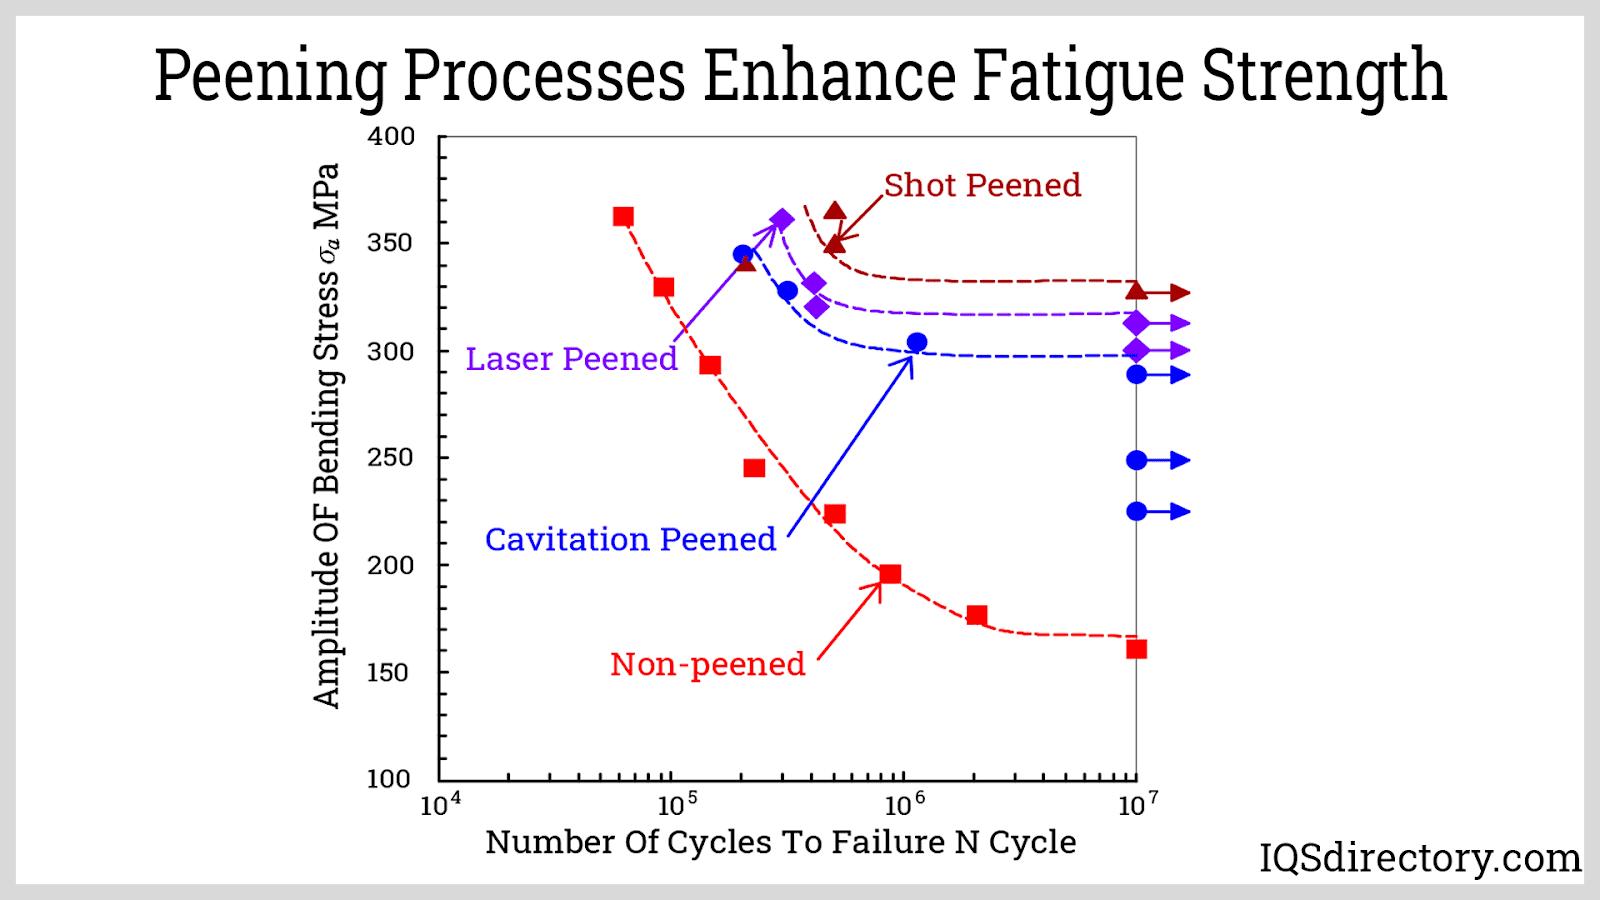 Peening Processes Enhance Fatigue Strength